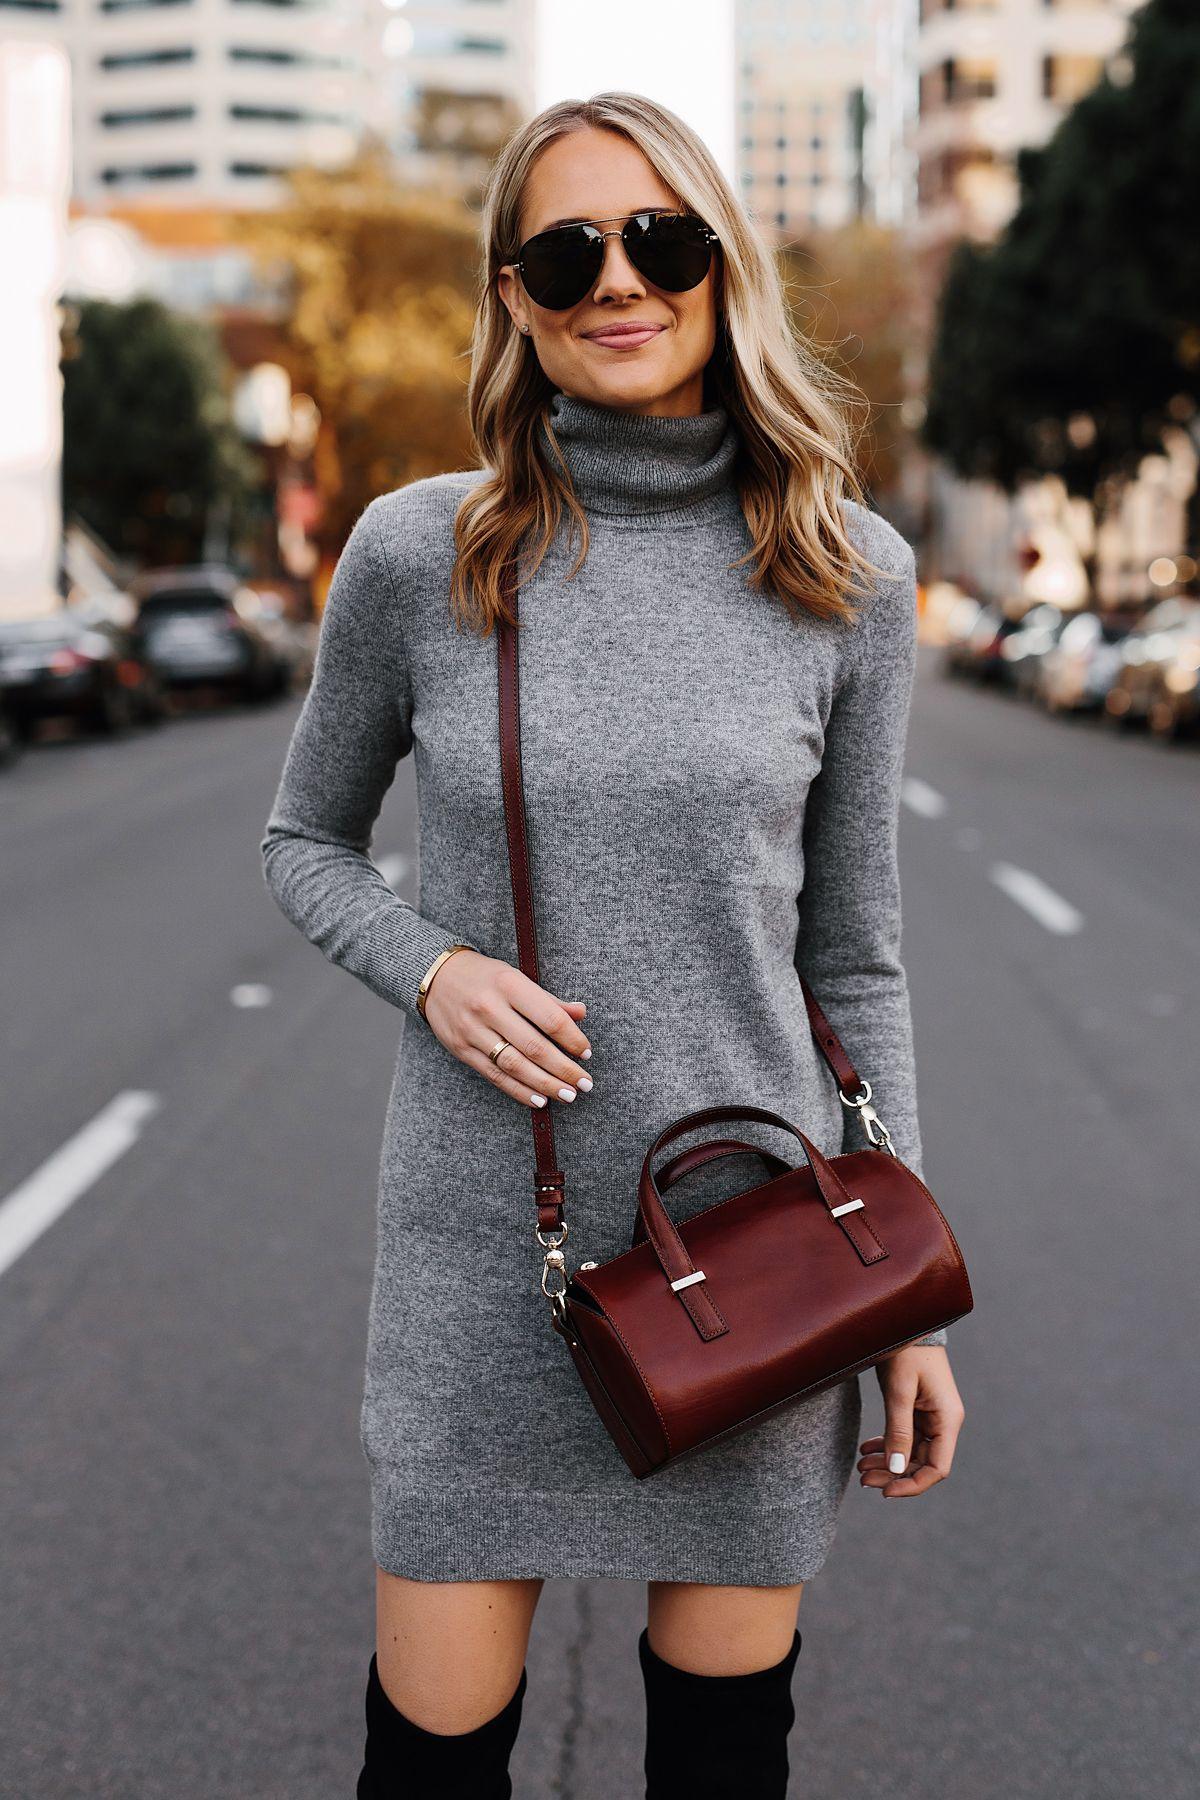 2b1358f0d39 Blonde Woman Wearing Grey Turtleneck Sweater Dress Brahmin Crossbody  Fashion Jackson San Diego Fashion Blogger Street Style